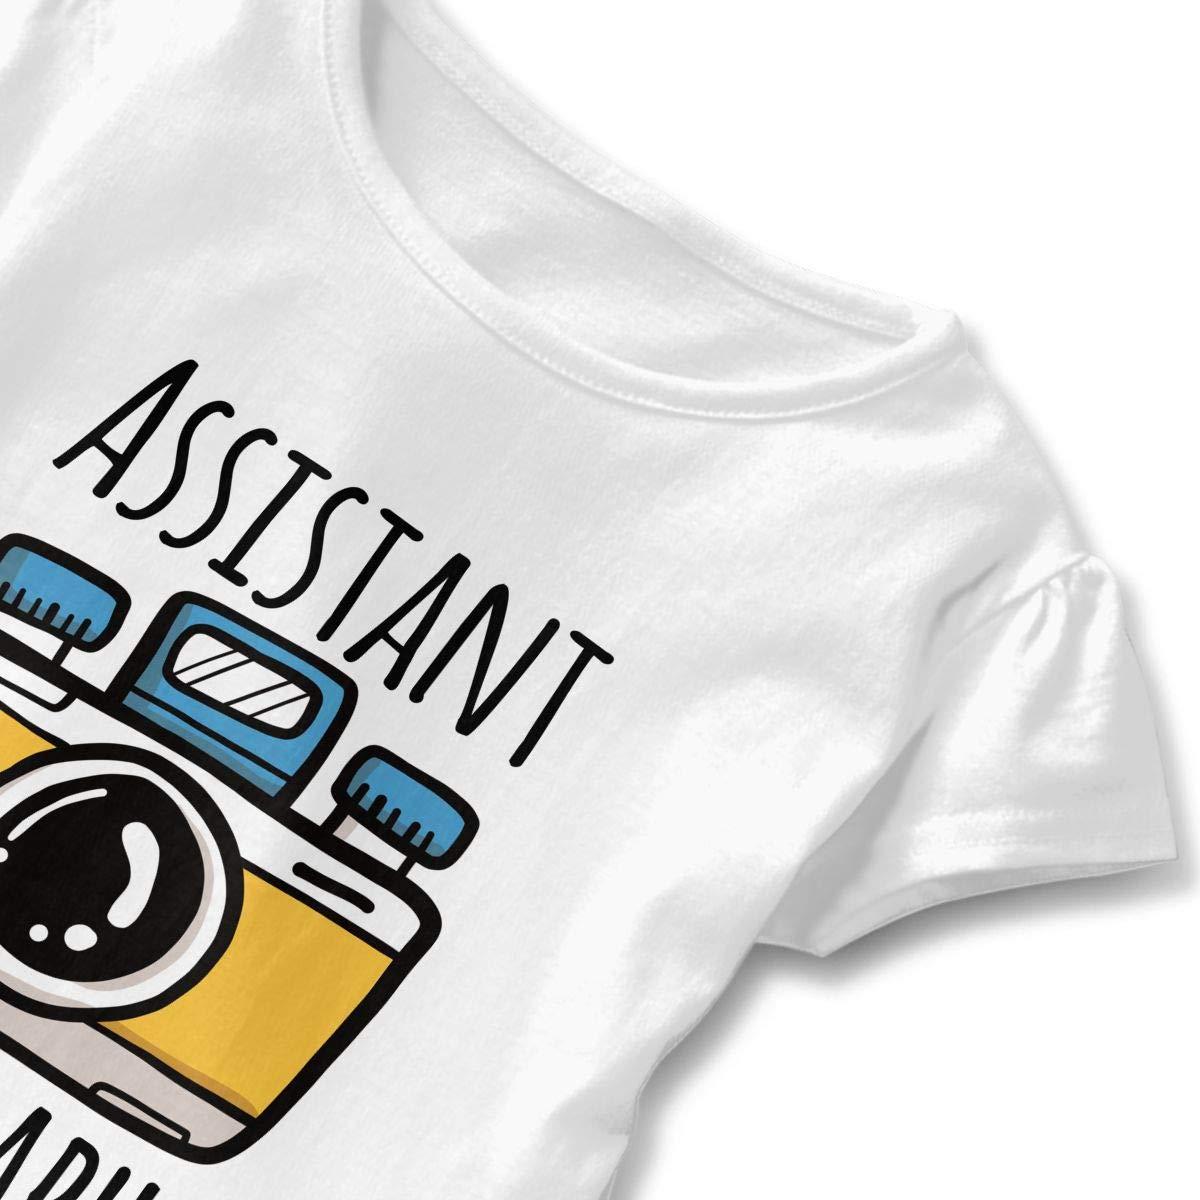 Cheng Jian Bo Assistant Photographer Toddler Girls T Shirt Kids Cotton Short Sleeve Ruffle Tee